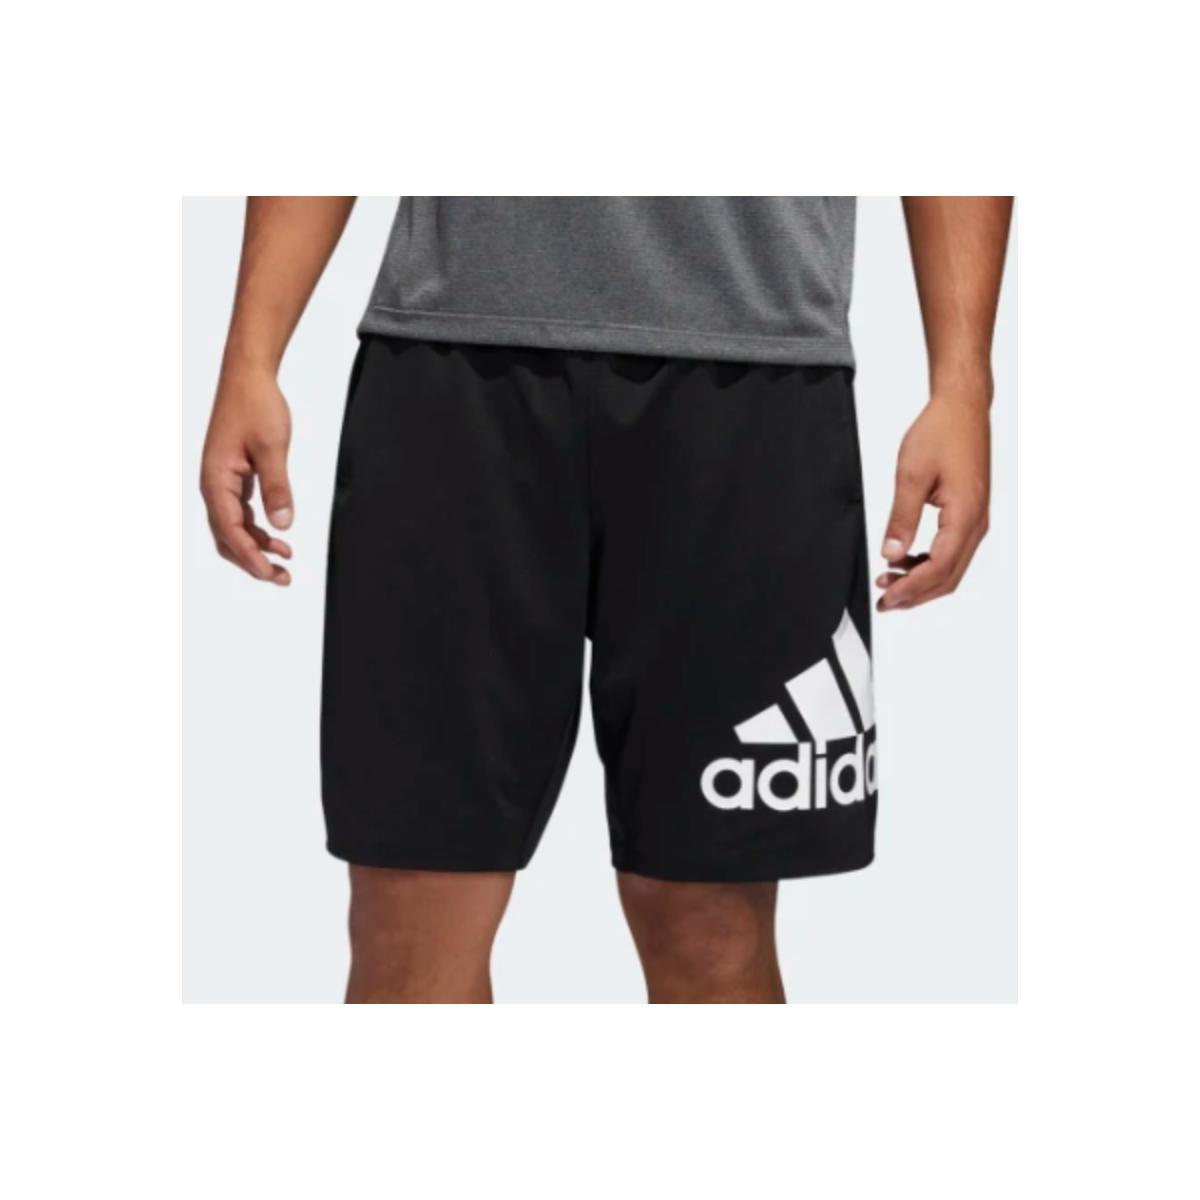 Bermuda Masculina Adidas Du1592 4kspr a Bos 9 m Preto